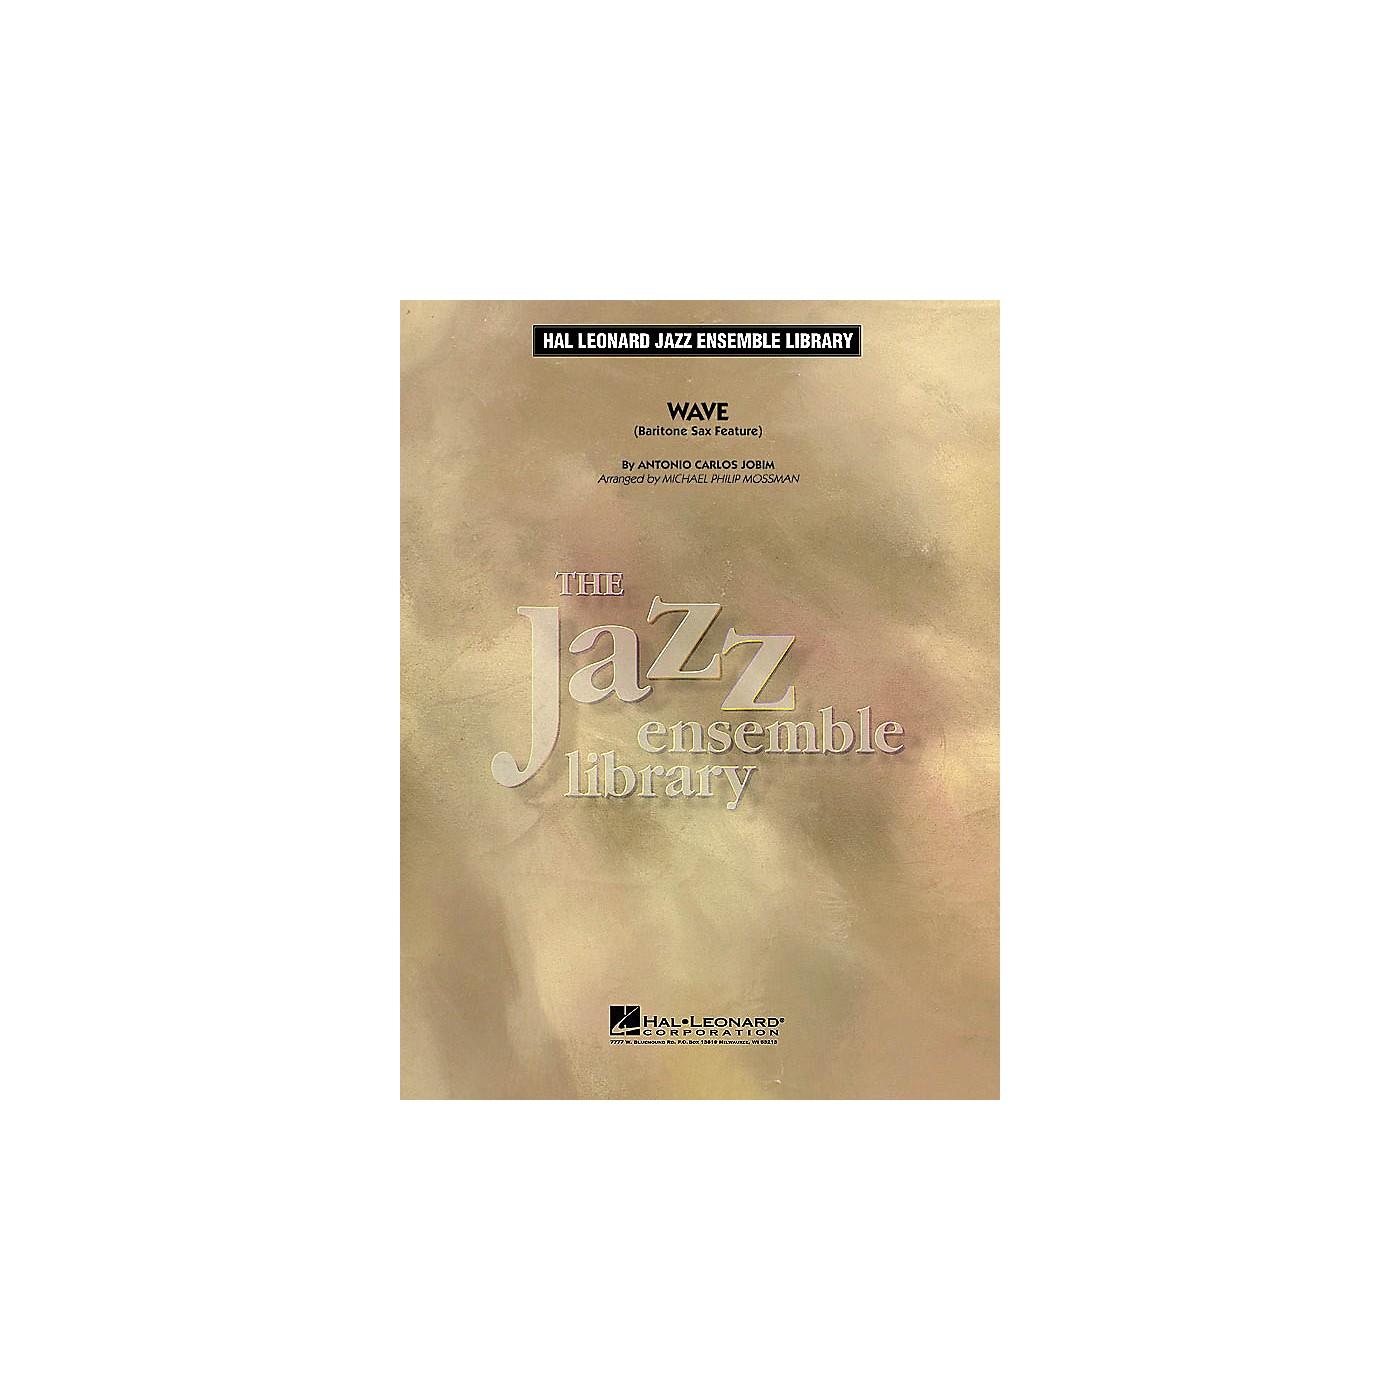 Hal Leonard Wave (Baritone Sax Feature) Jazz Band Level 4 Arranged by Michael Philip Mossman thumbnail